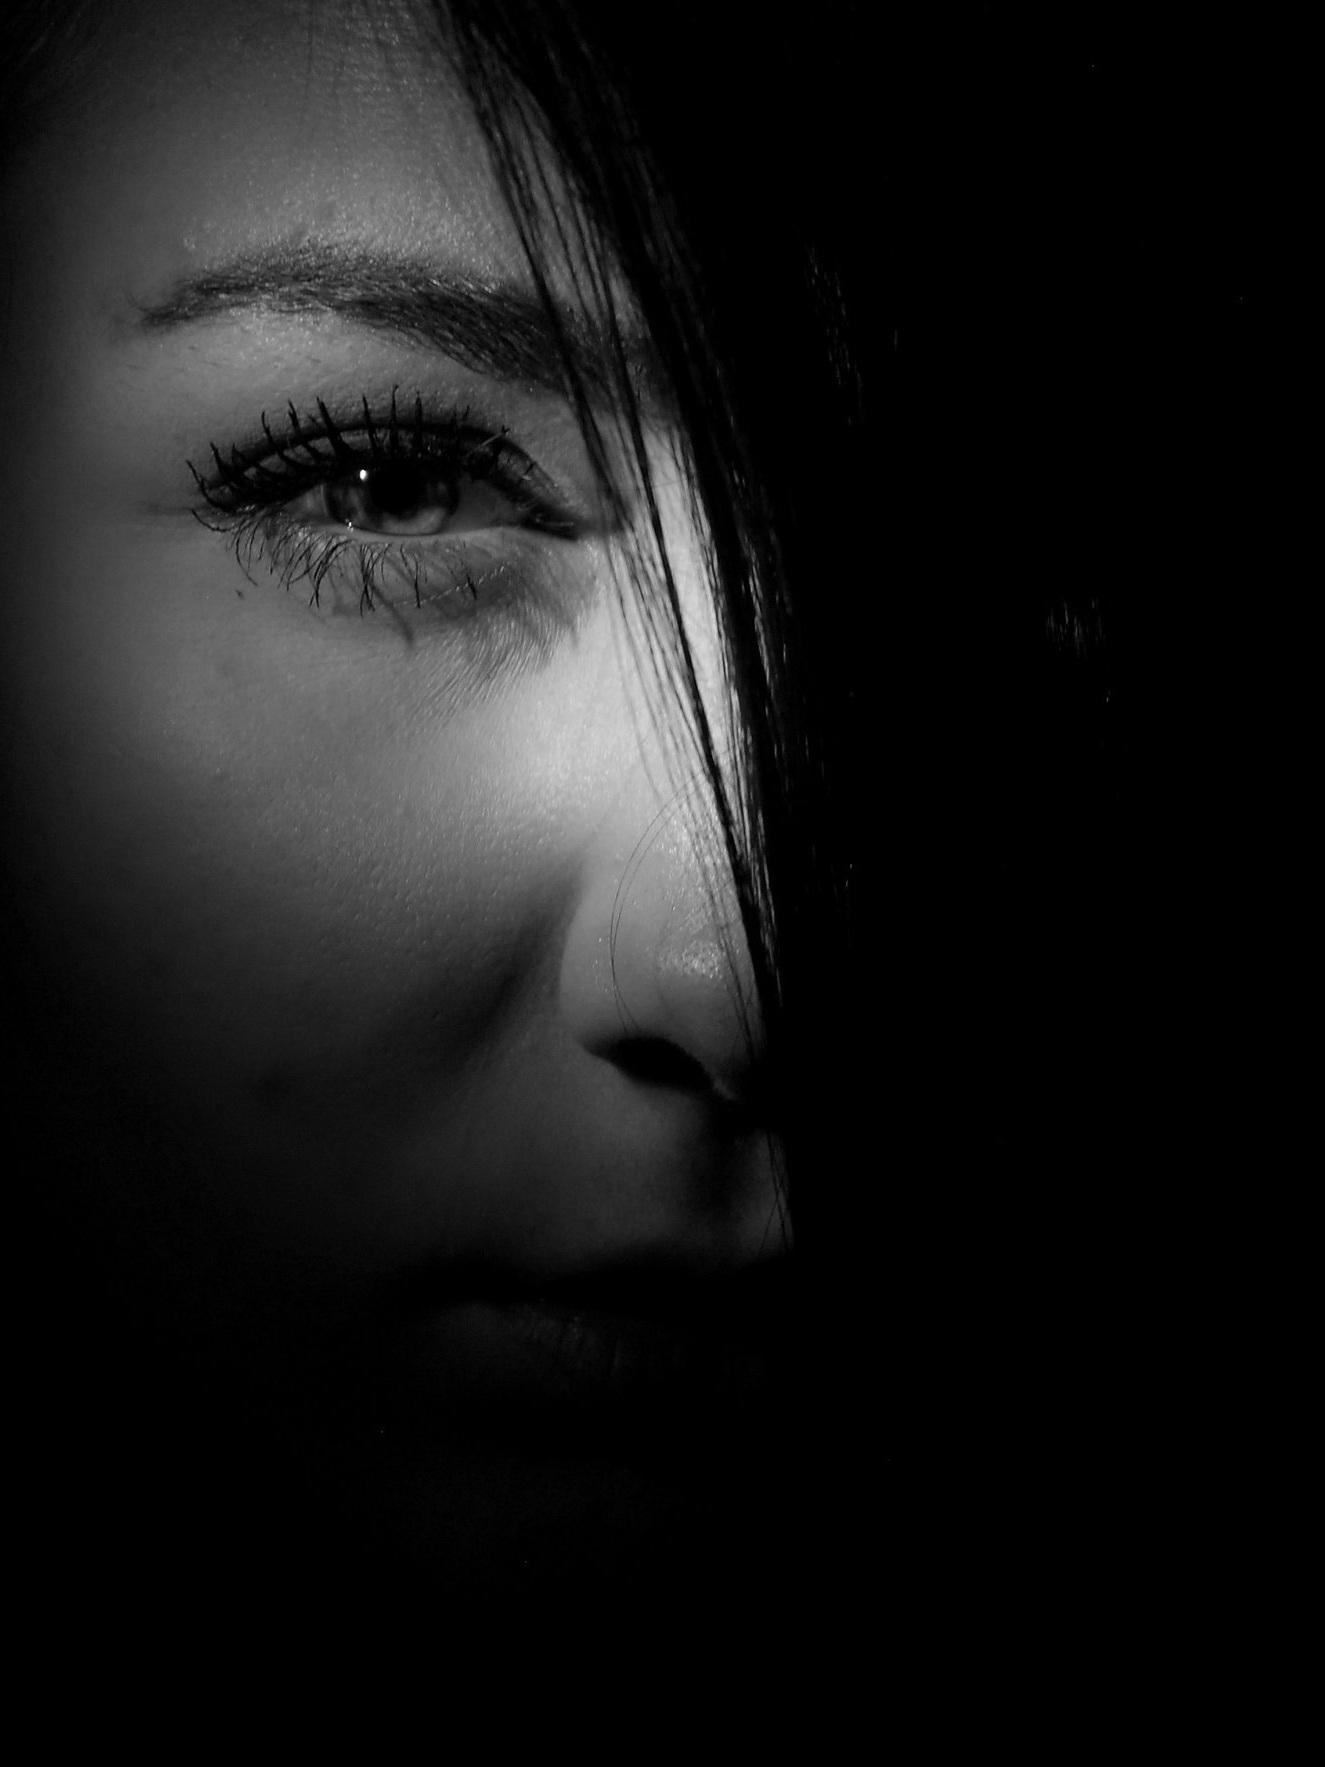 black-and-white-dark-eye-37315.jpg